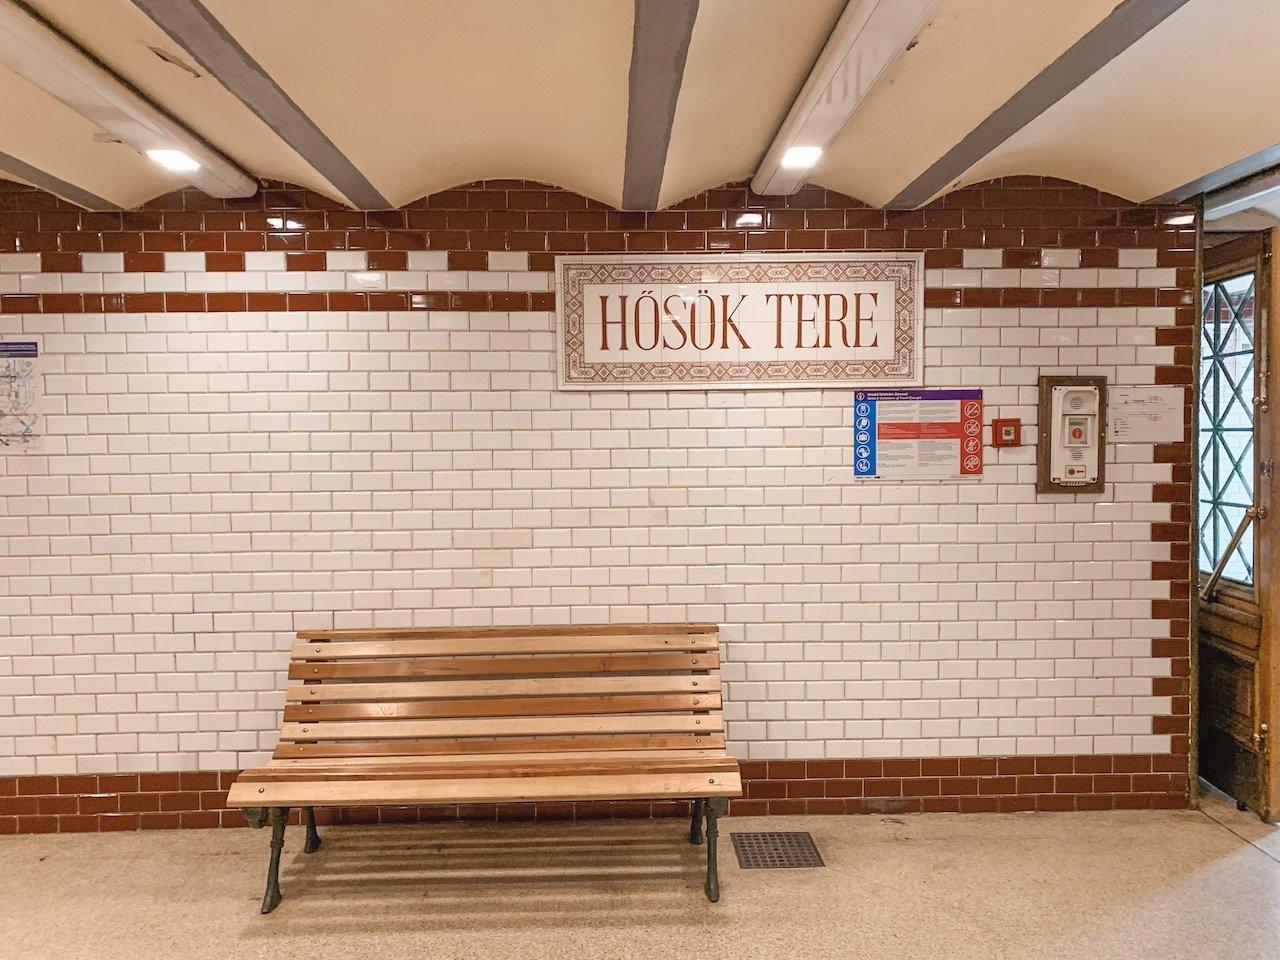 budapest-metro-traslados